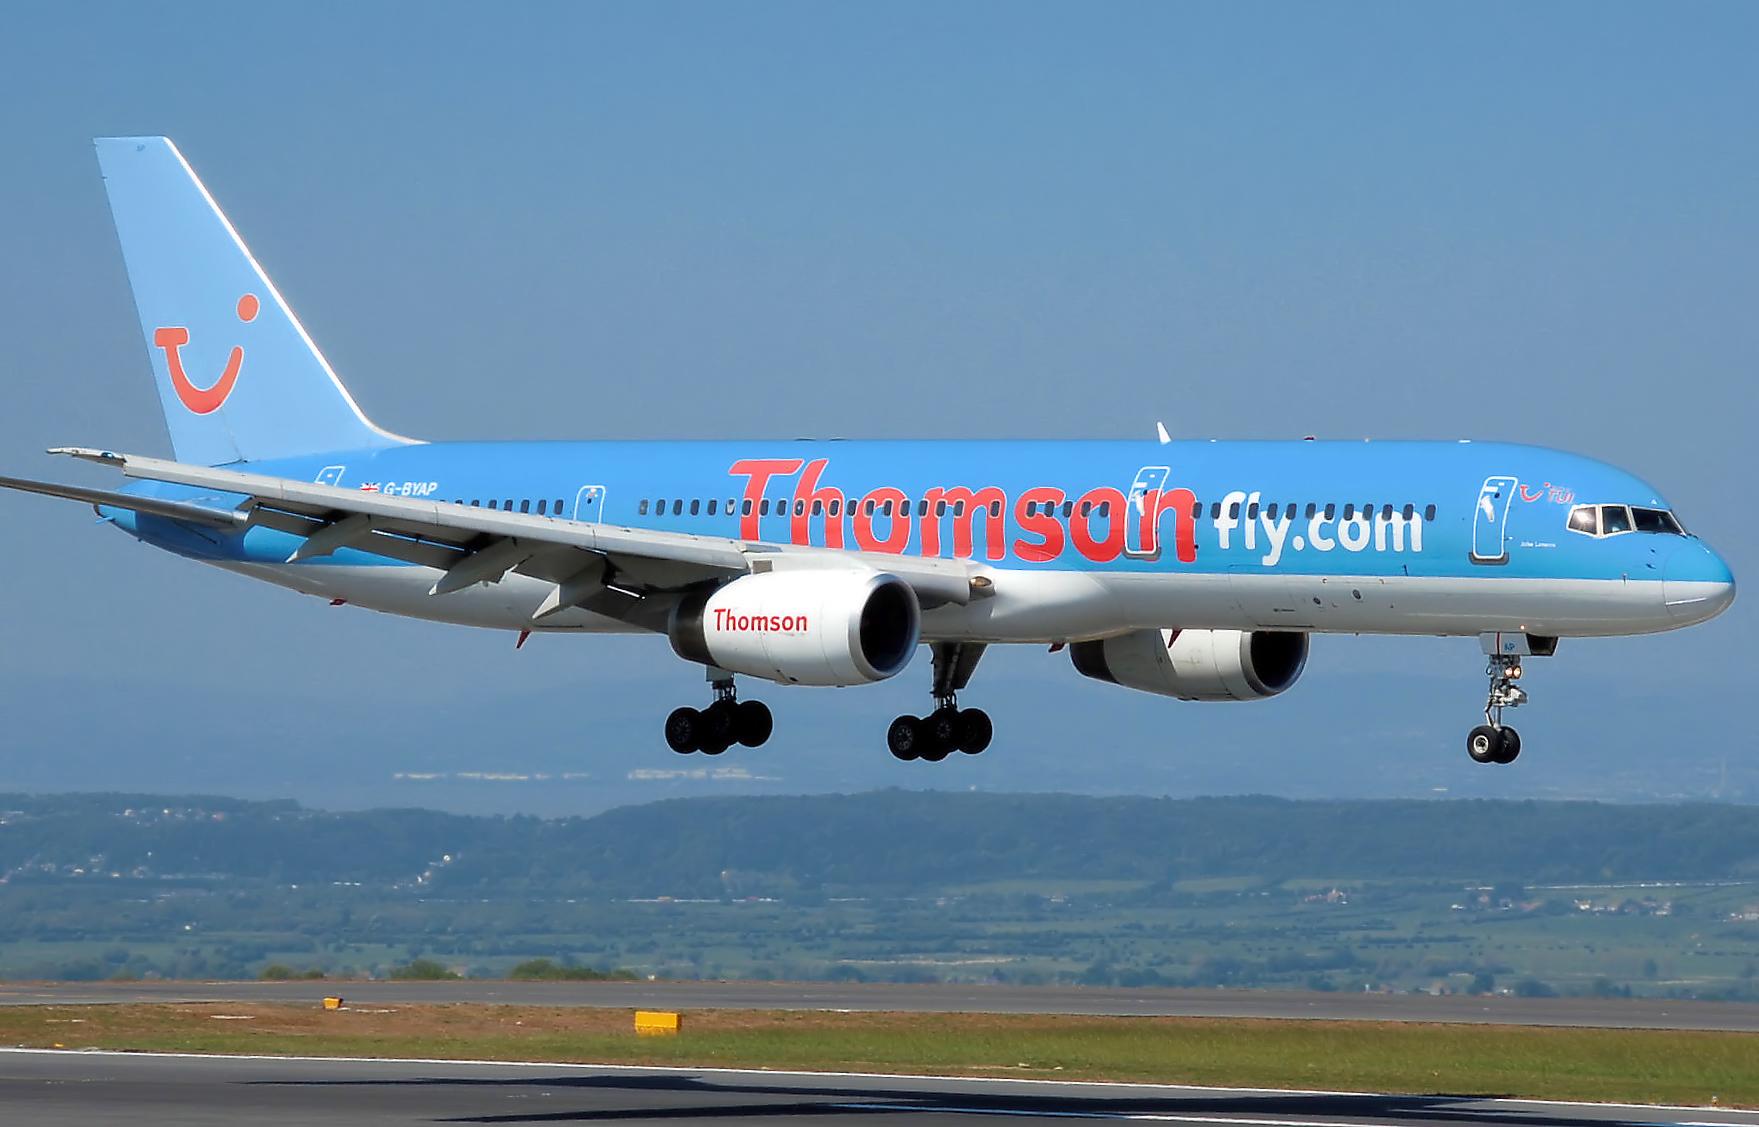 File:Thomsonfly b757-200 g-byap arp.jpg - Wikipedia